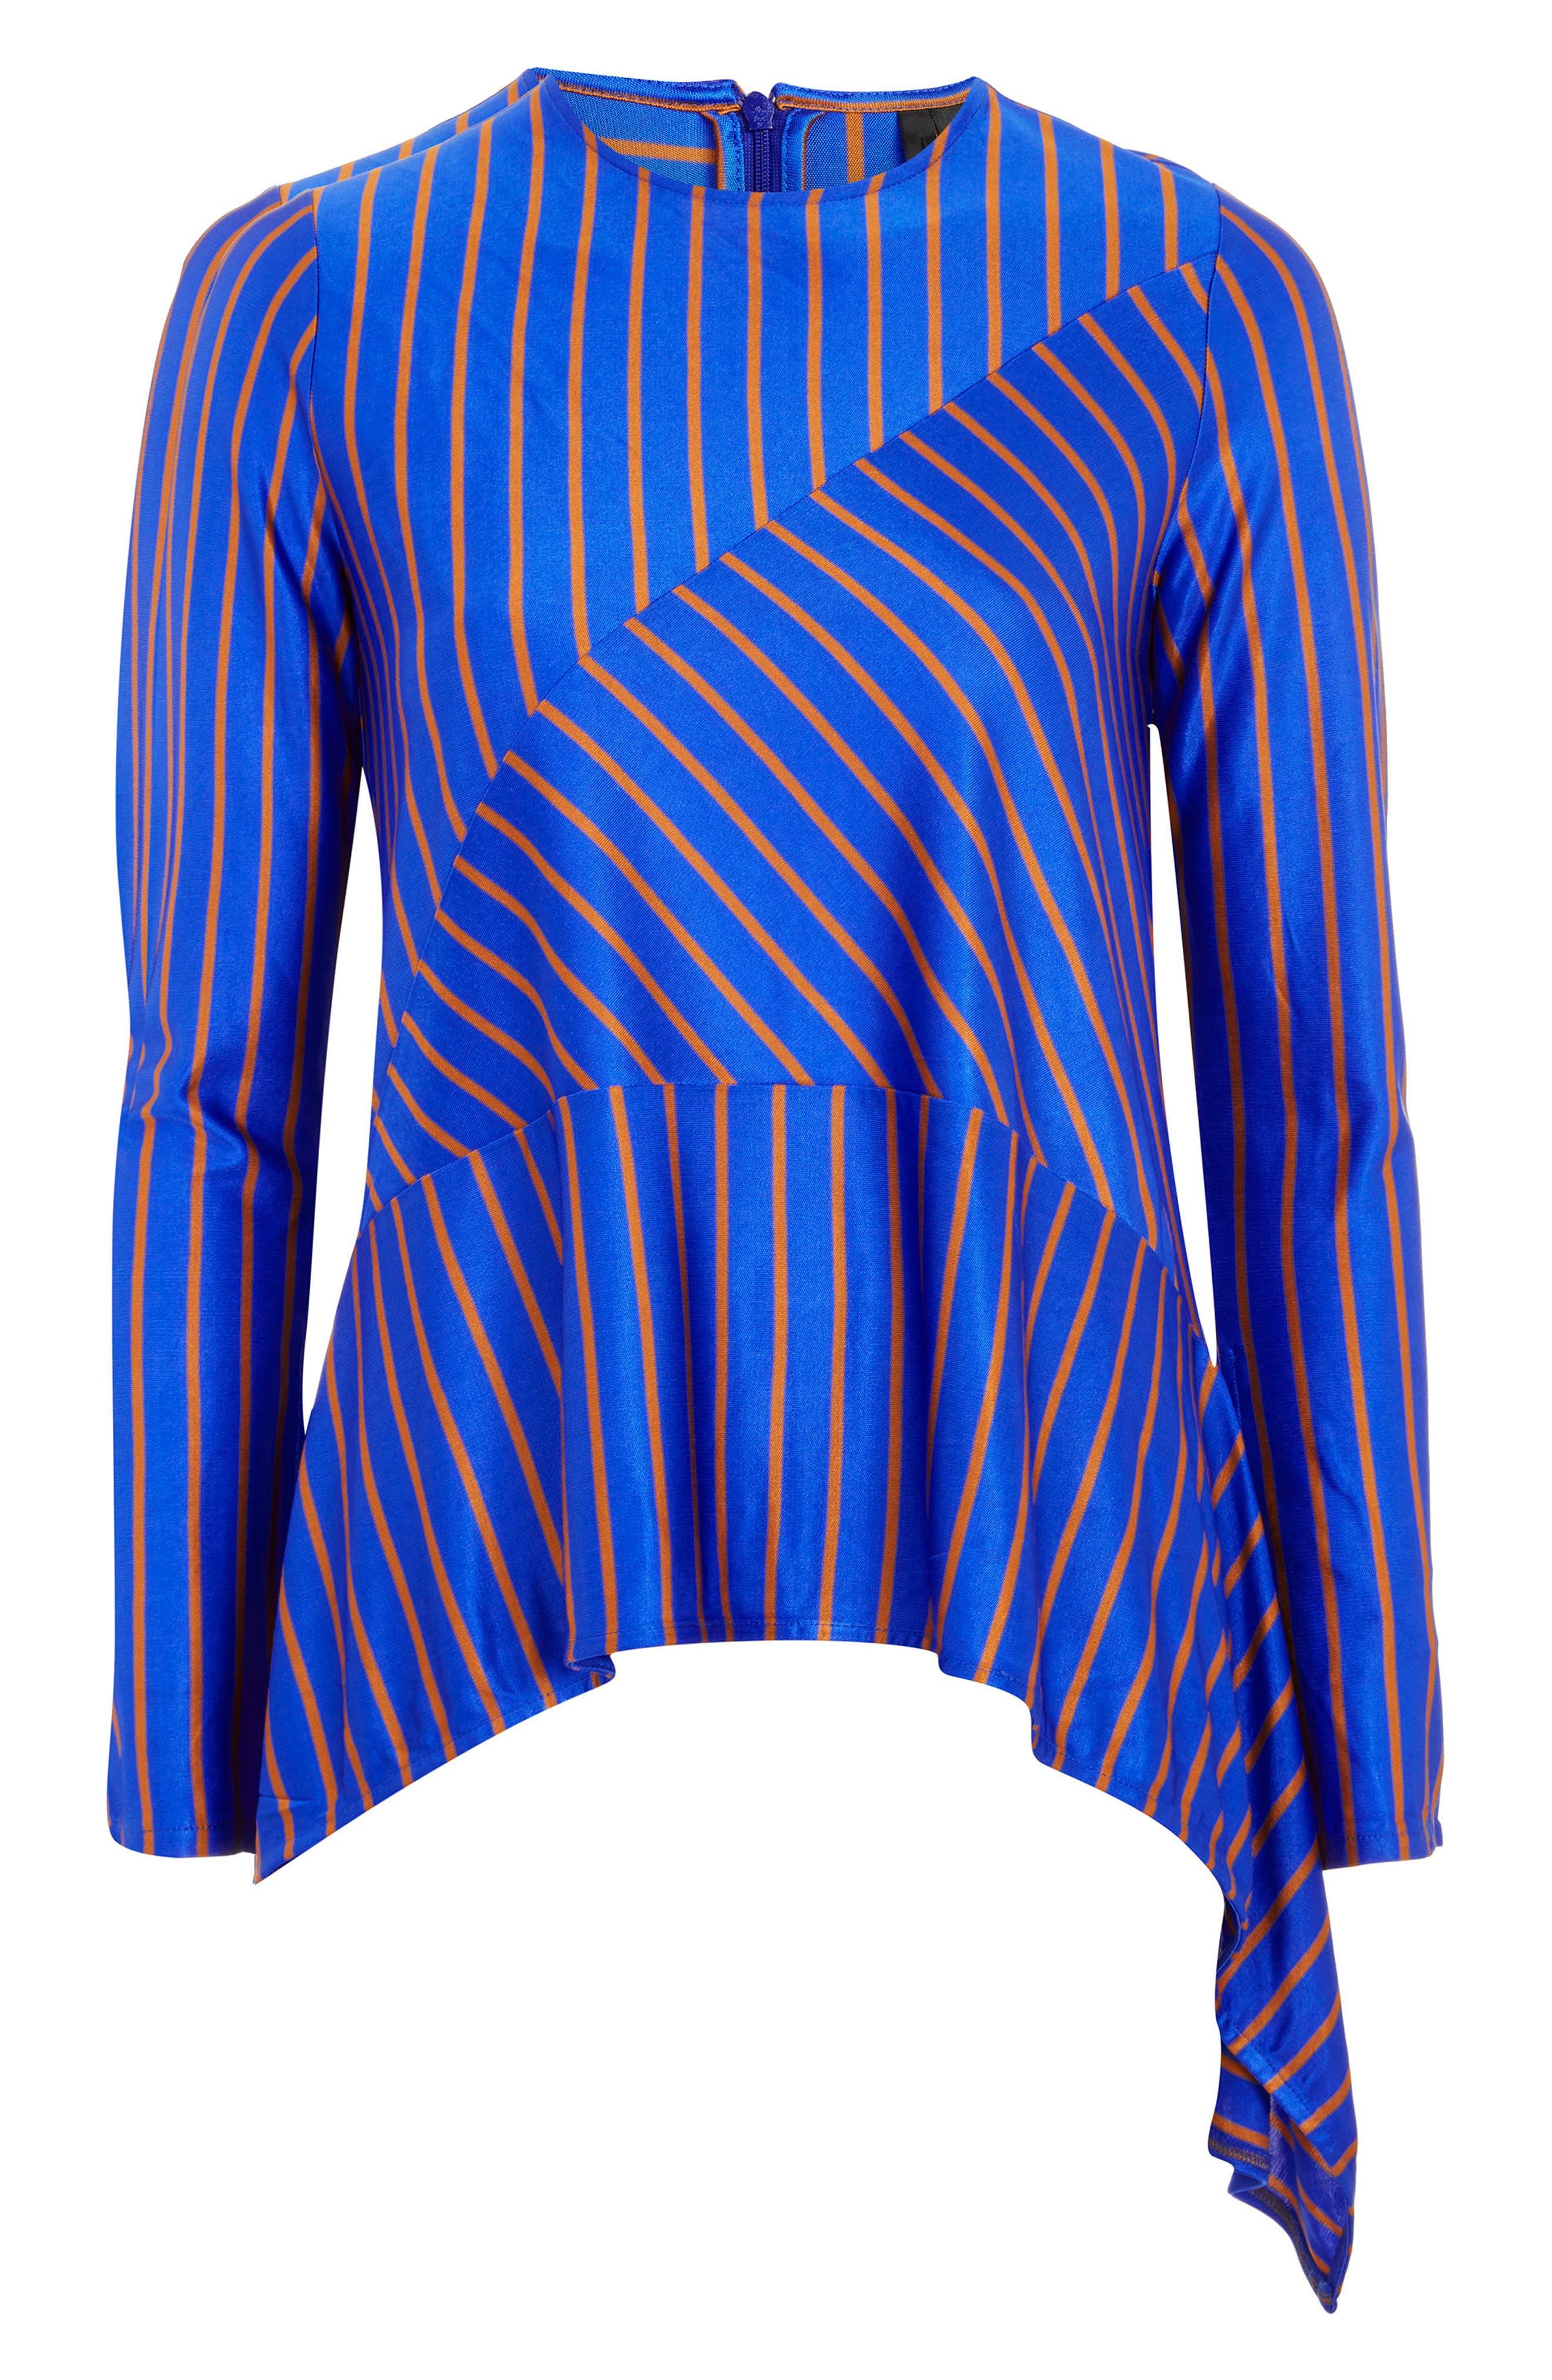 Cutabout Stripe Top,                             Main thumbnail 1, color,                             Blue Multi